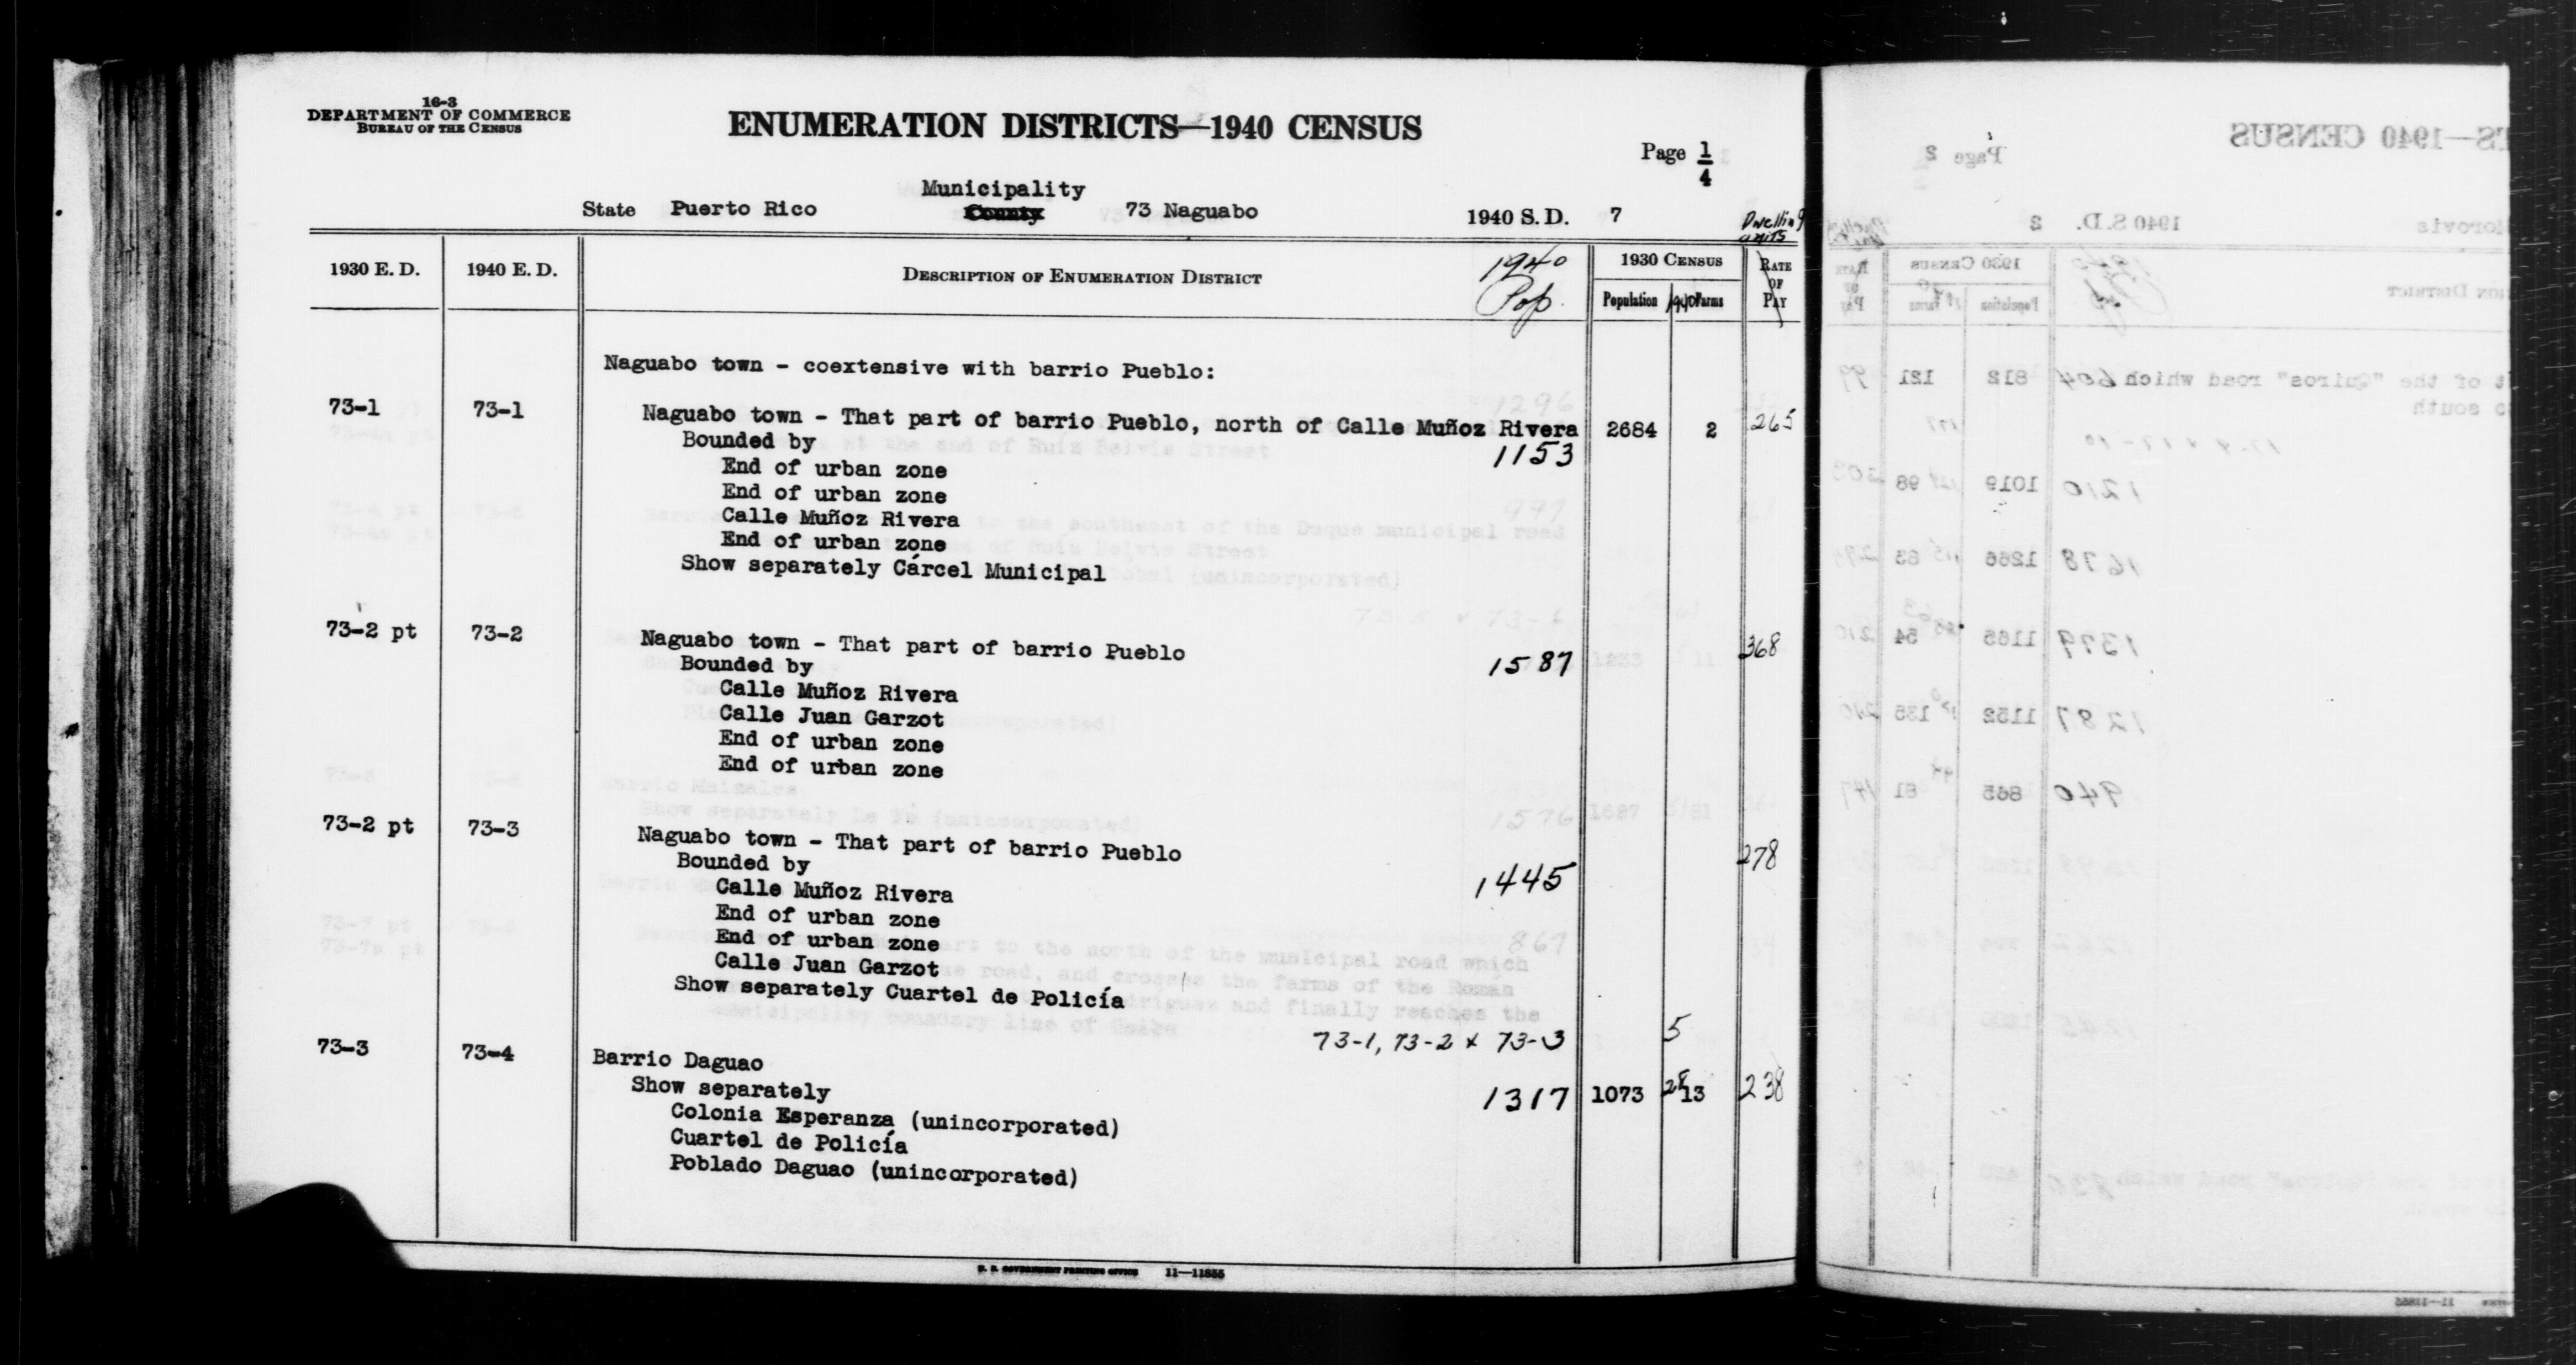 1940 Census Enumeration District Descriptions - Puerto Rico - Naguabo County - ED 73-1, ED 73-2, ED 73-3, ED 73-4